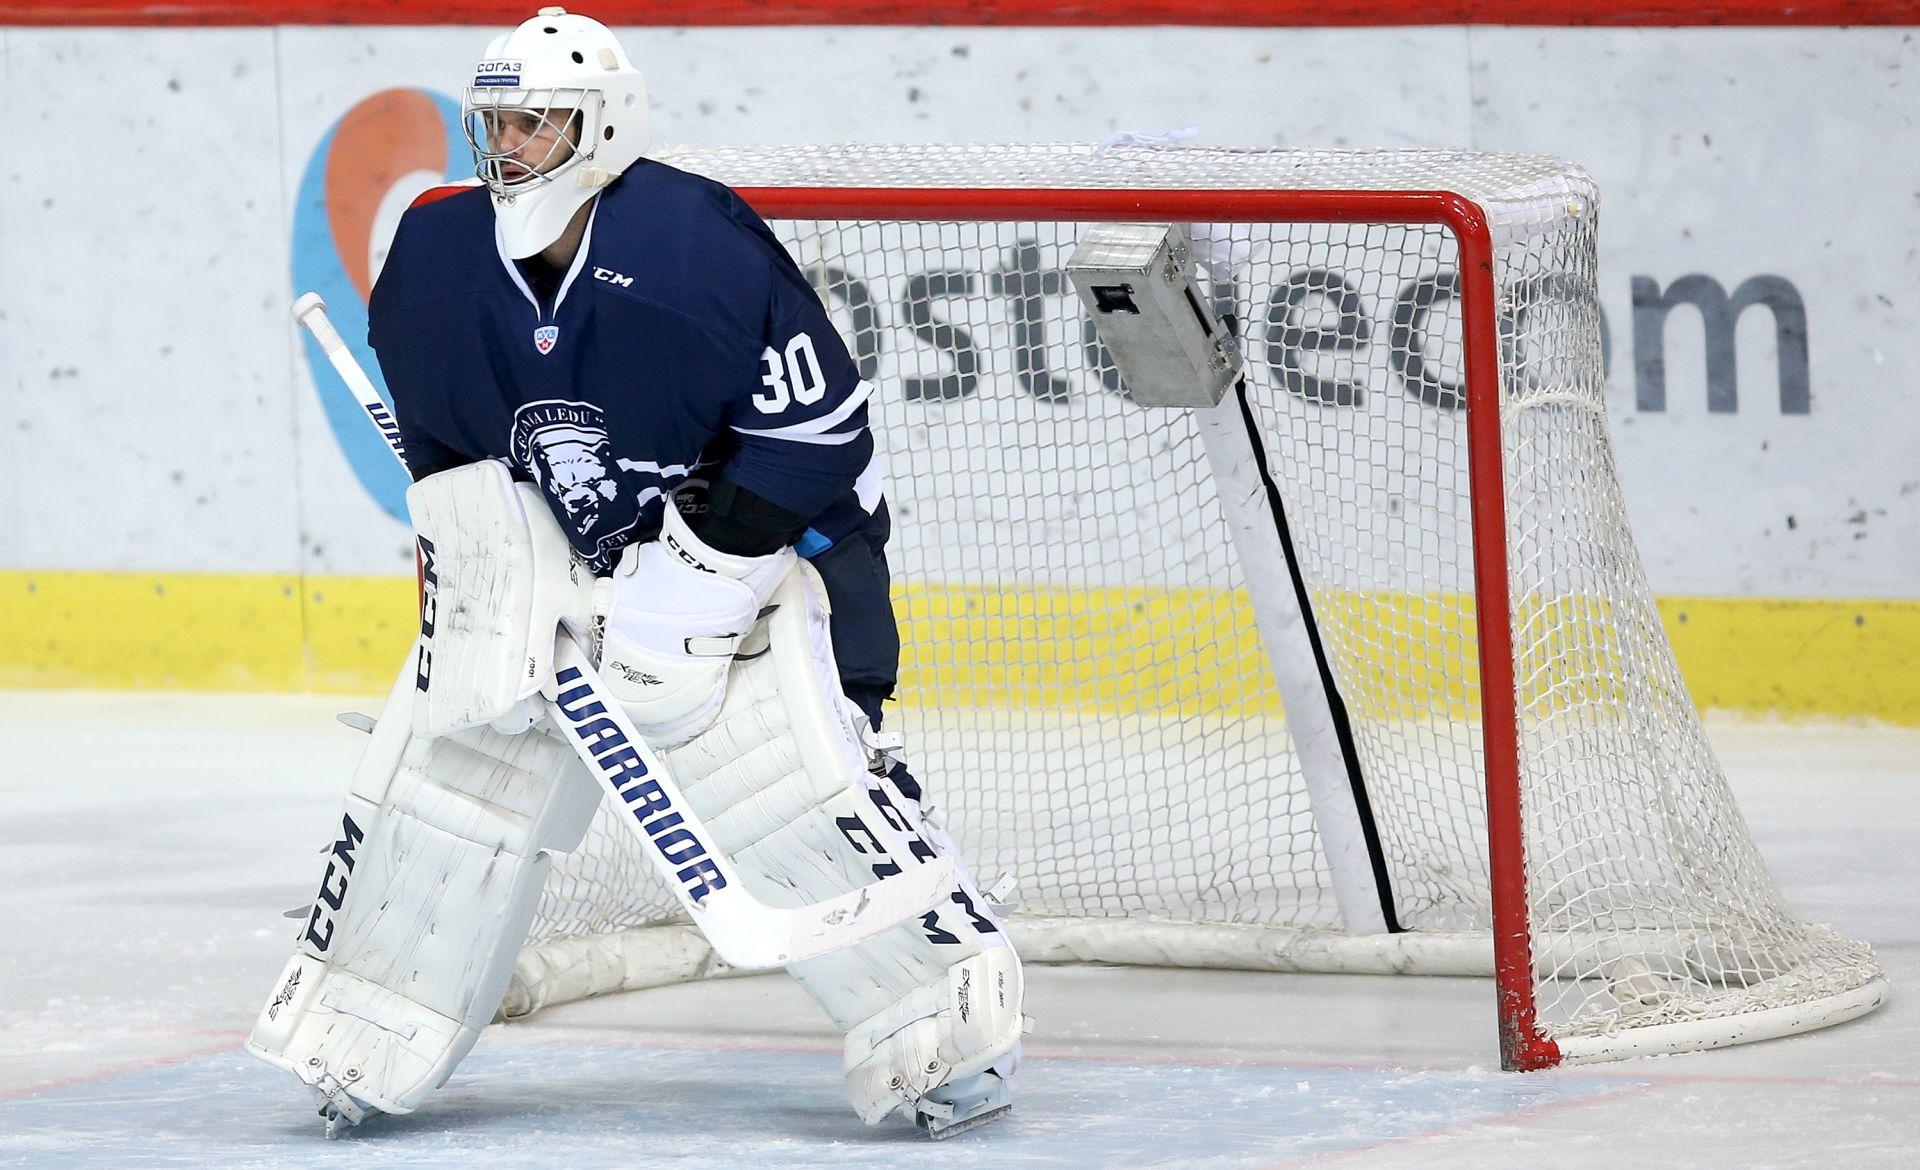 VODSTVO KHL IZABRALO: Danny Taylor vratar tjedna